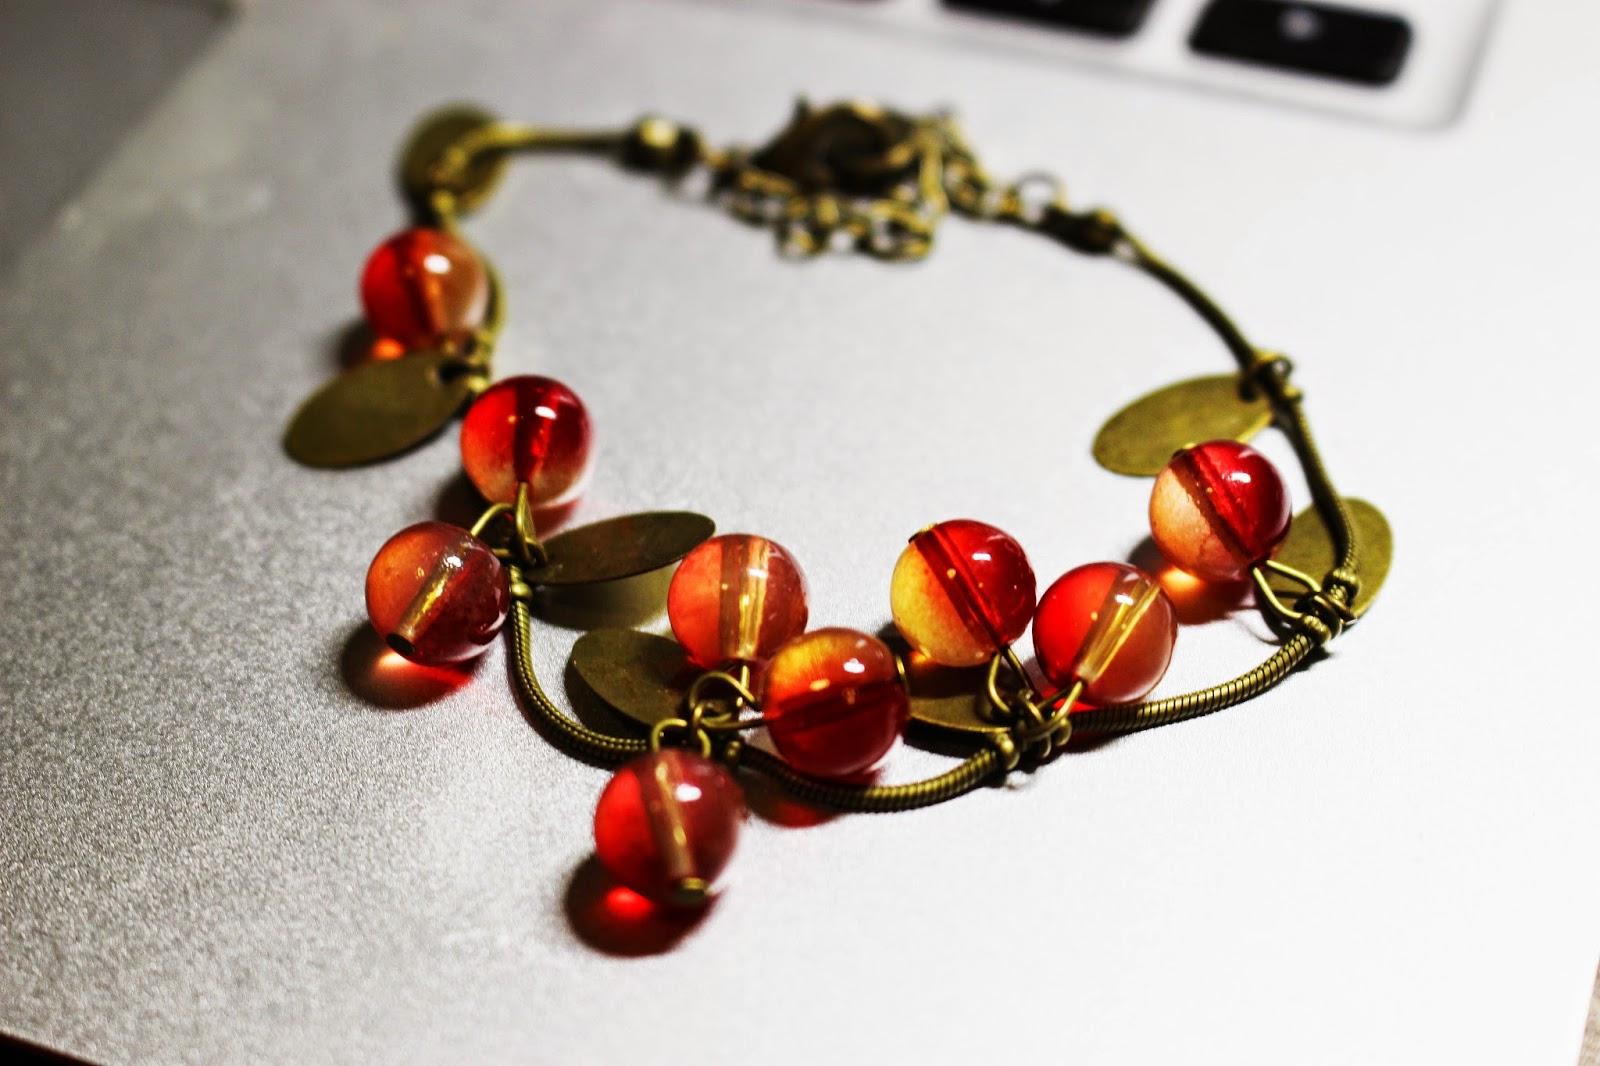 bornpretty review, bornpretty store, born pretty cherry bracelet, cherry bracelet buy, jewellery buy, born pretty, fashion blog, gold hair clip, daisy bracelet